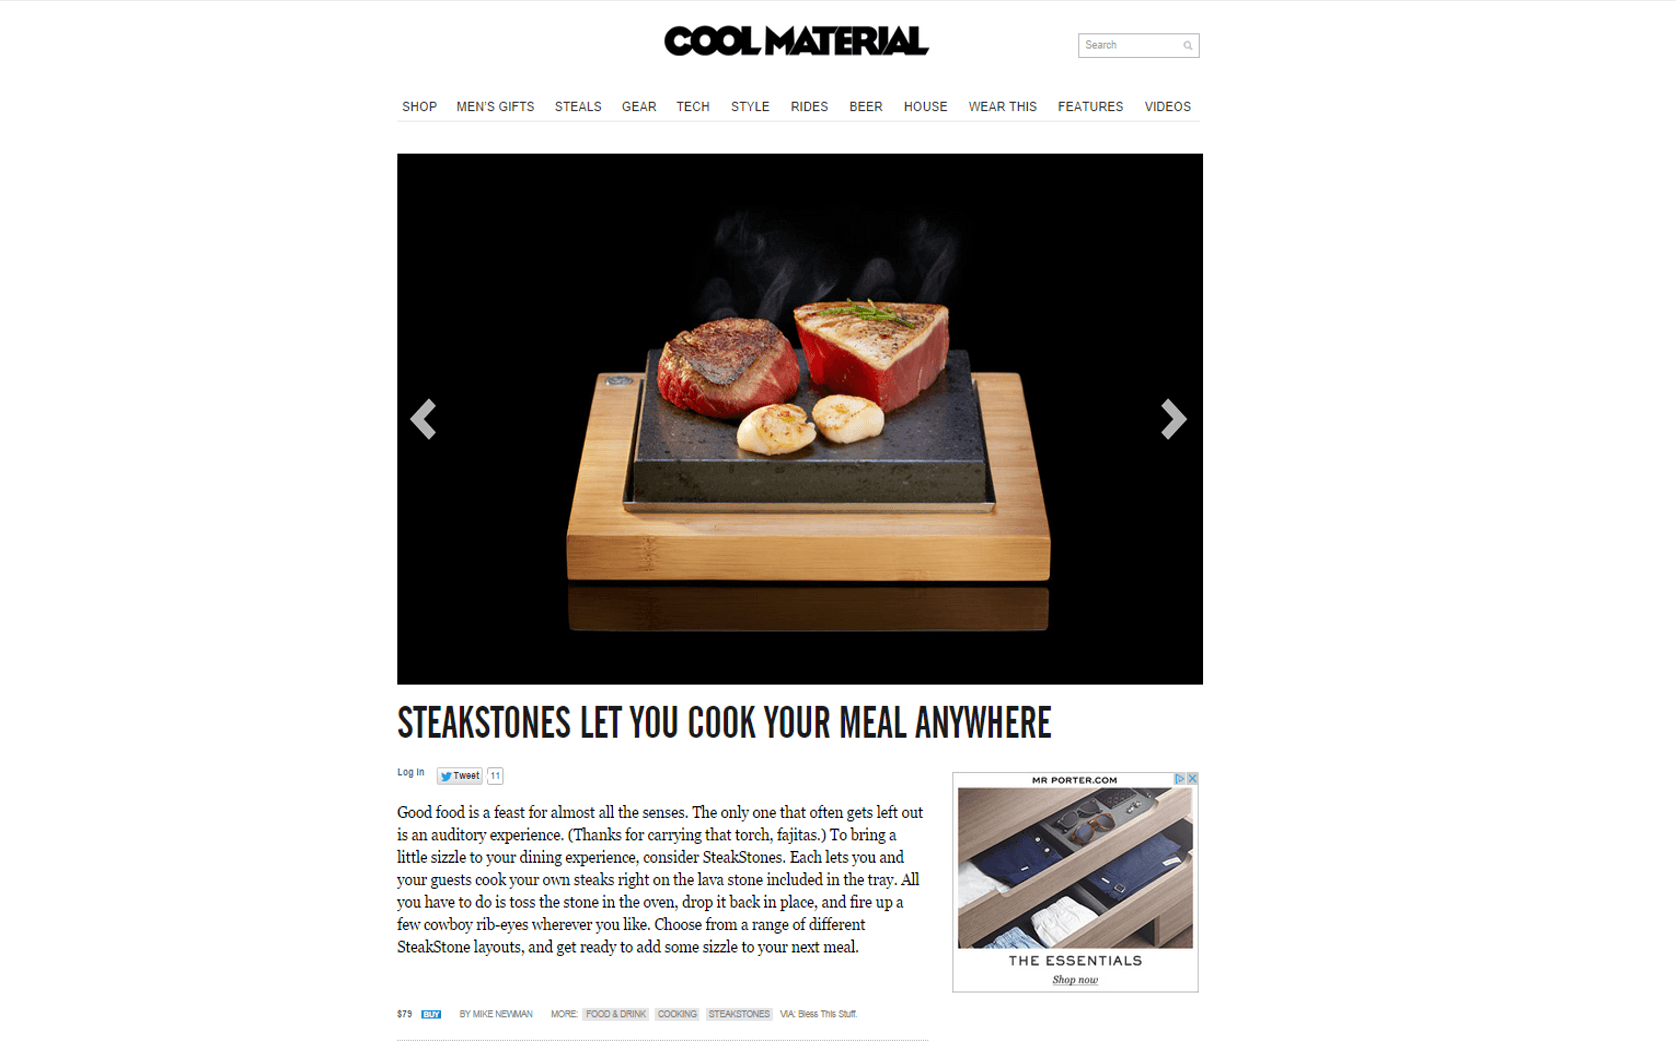 Cool Material - Hot Stuff in Cool Material